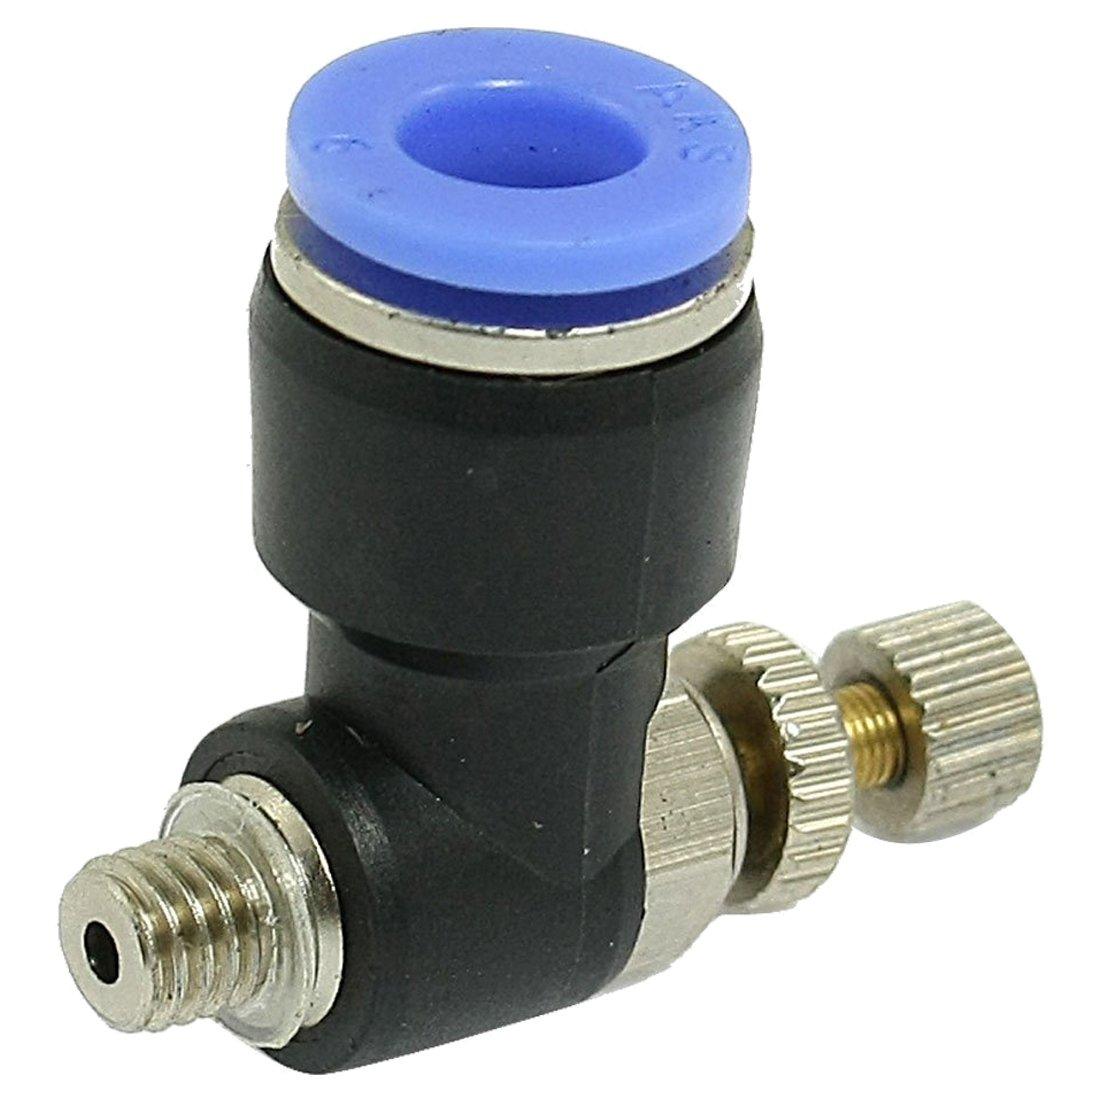 Nrpfell In 6 mm, 5 mm thread Pneumatic valve regulator quick couplings, 2 pcs